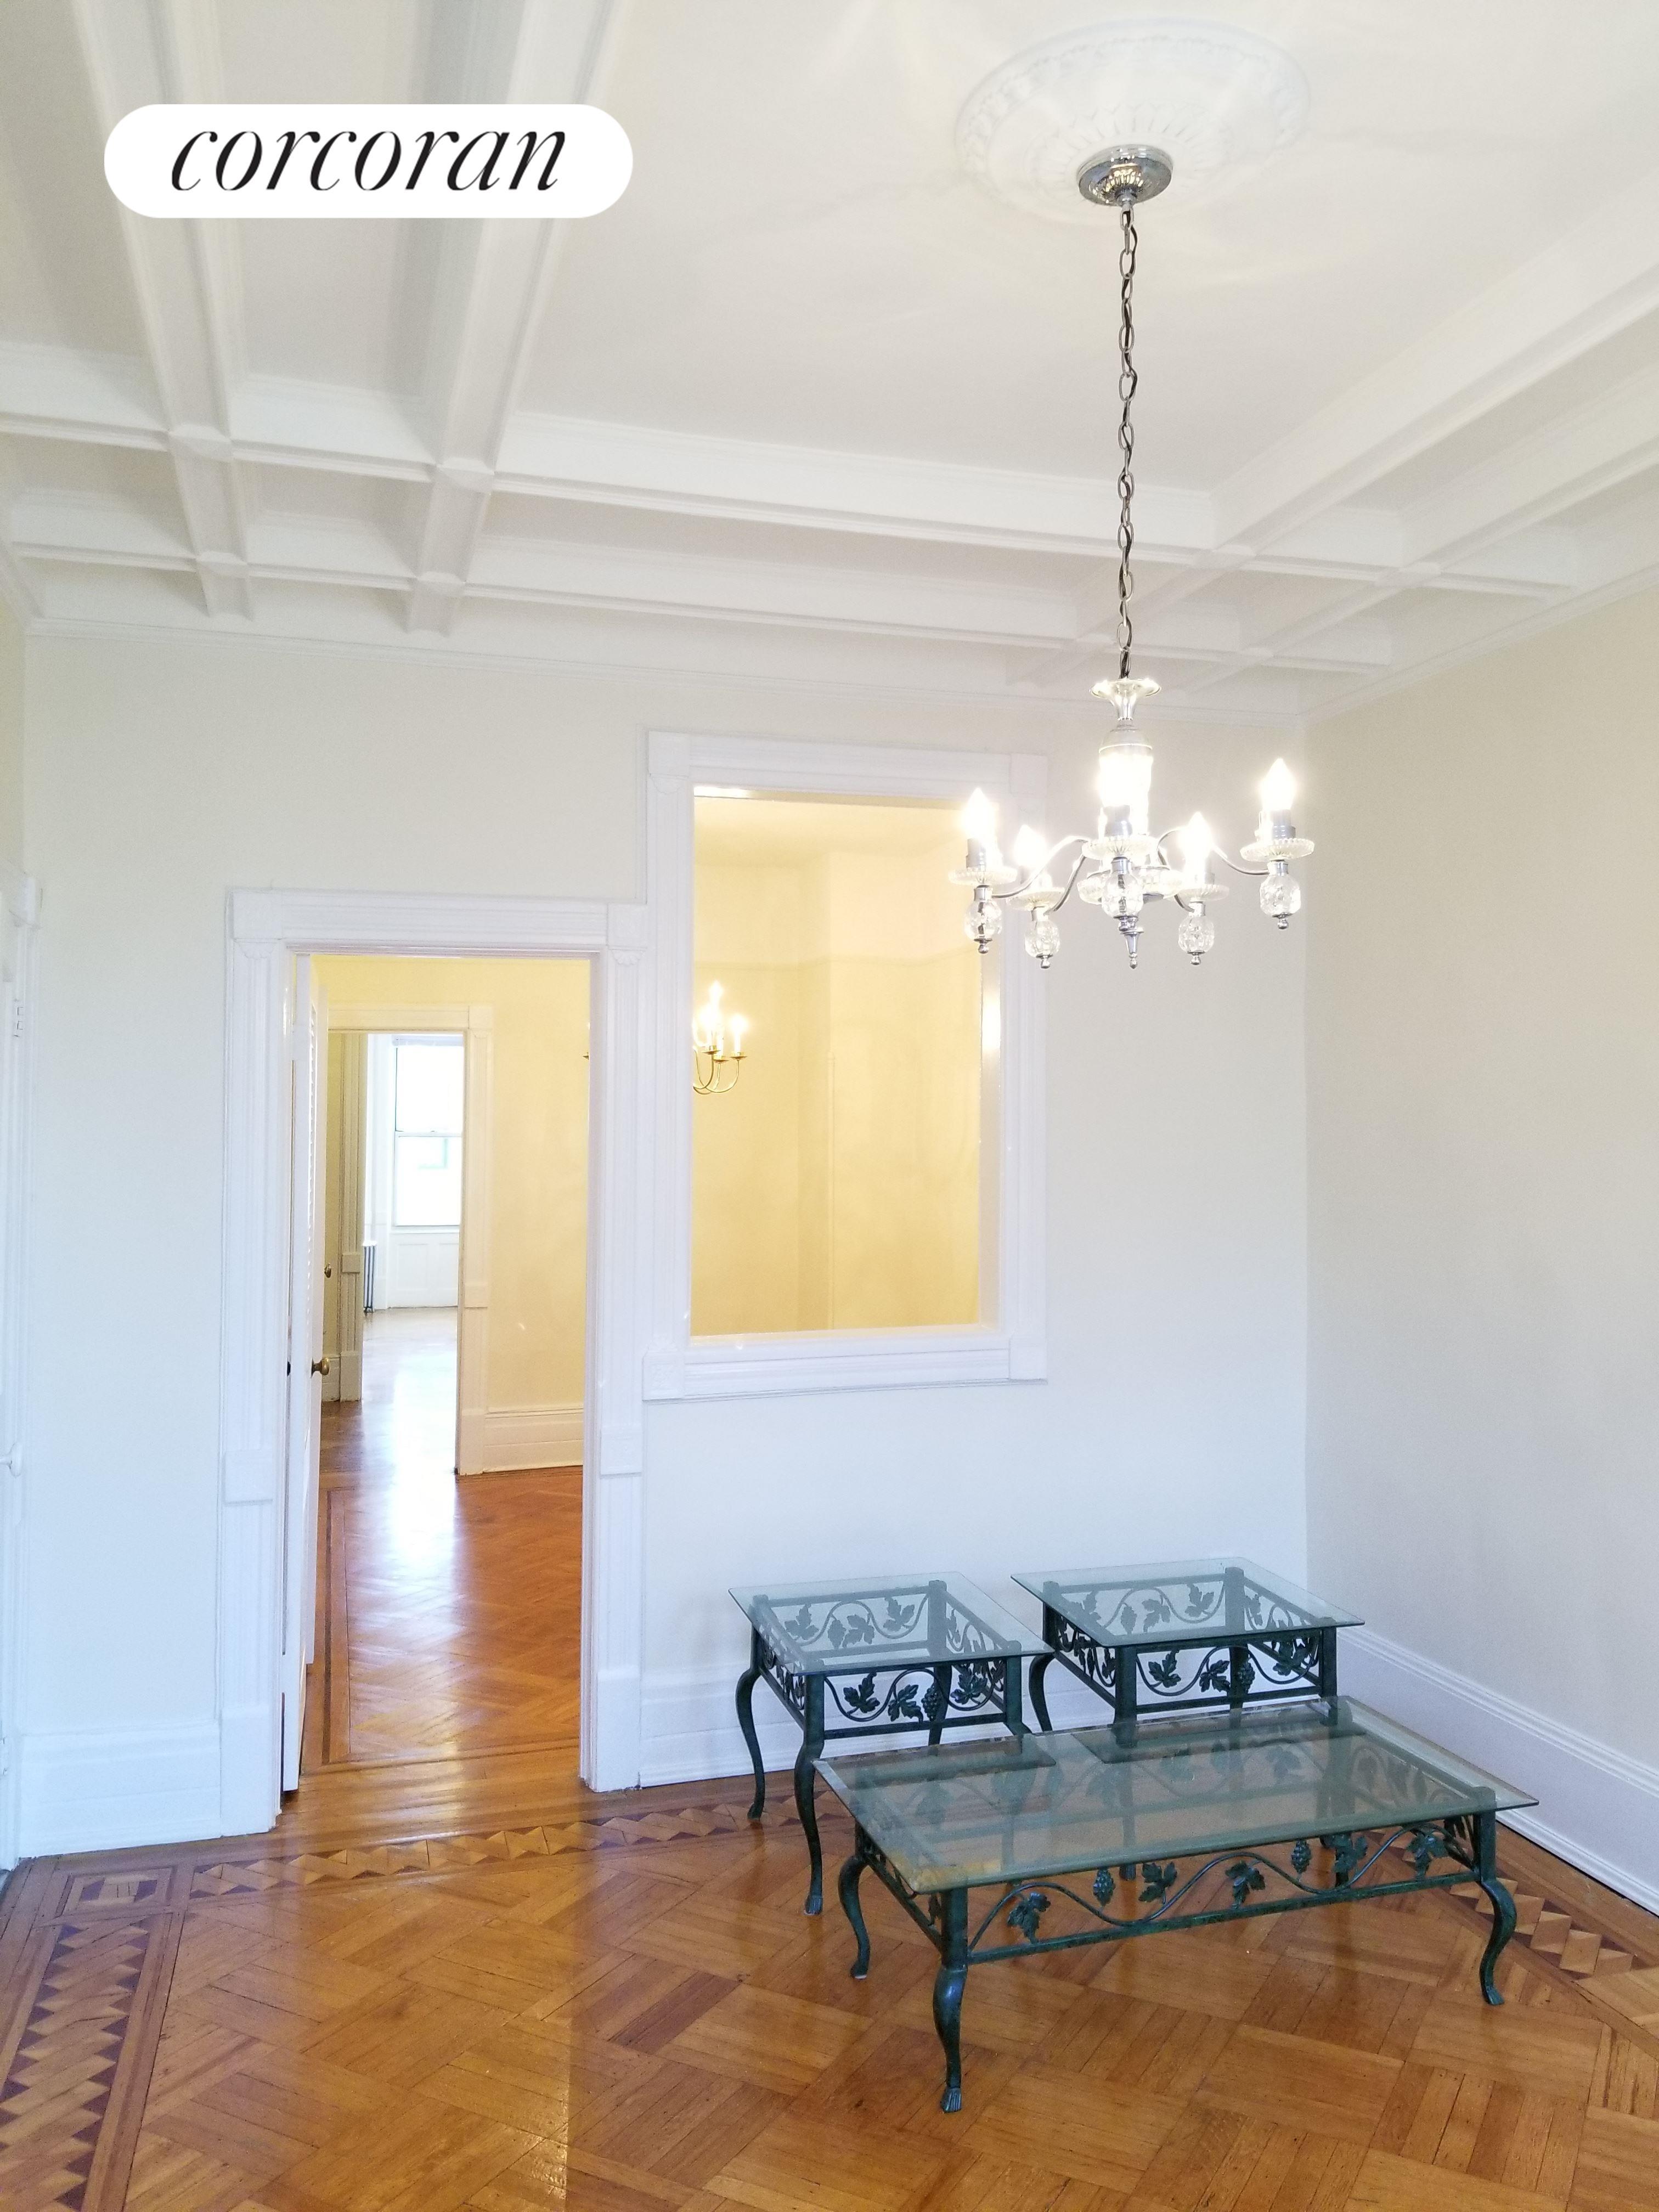 Corcoran, 336 Weirfield Street, Apt. 2, Bushwick Rentals, Brooklyn ...